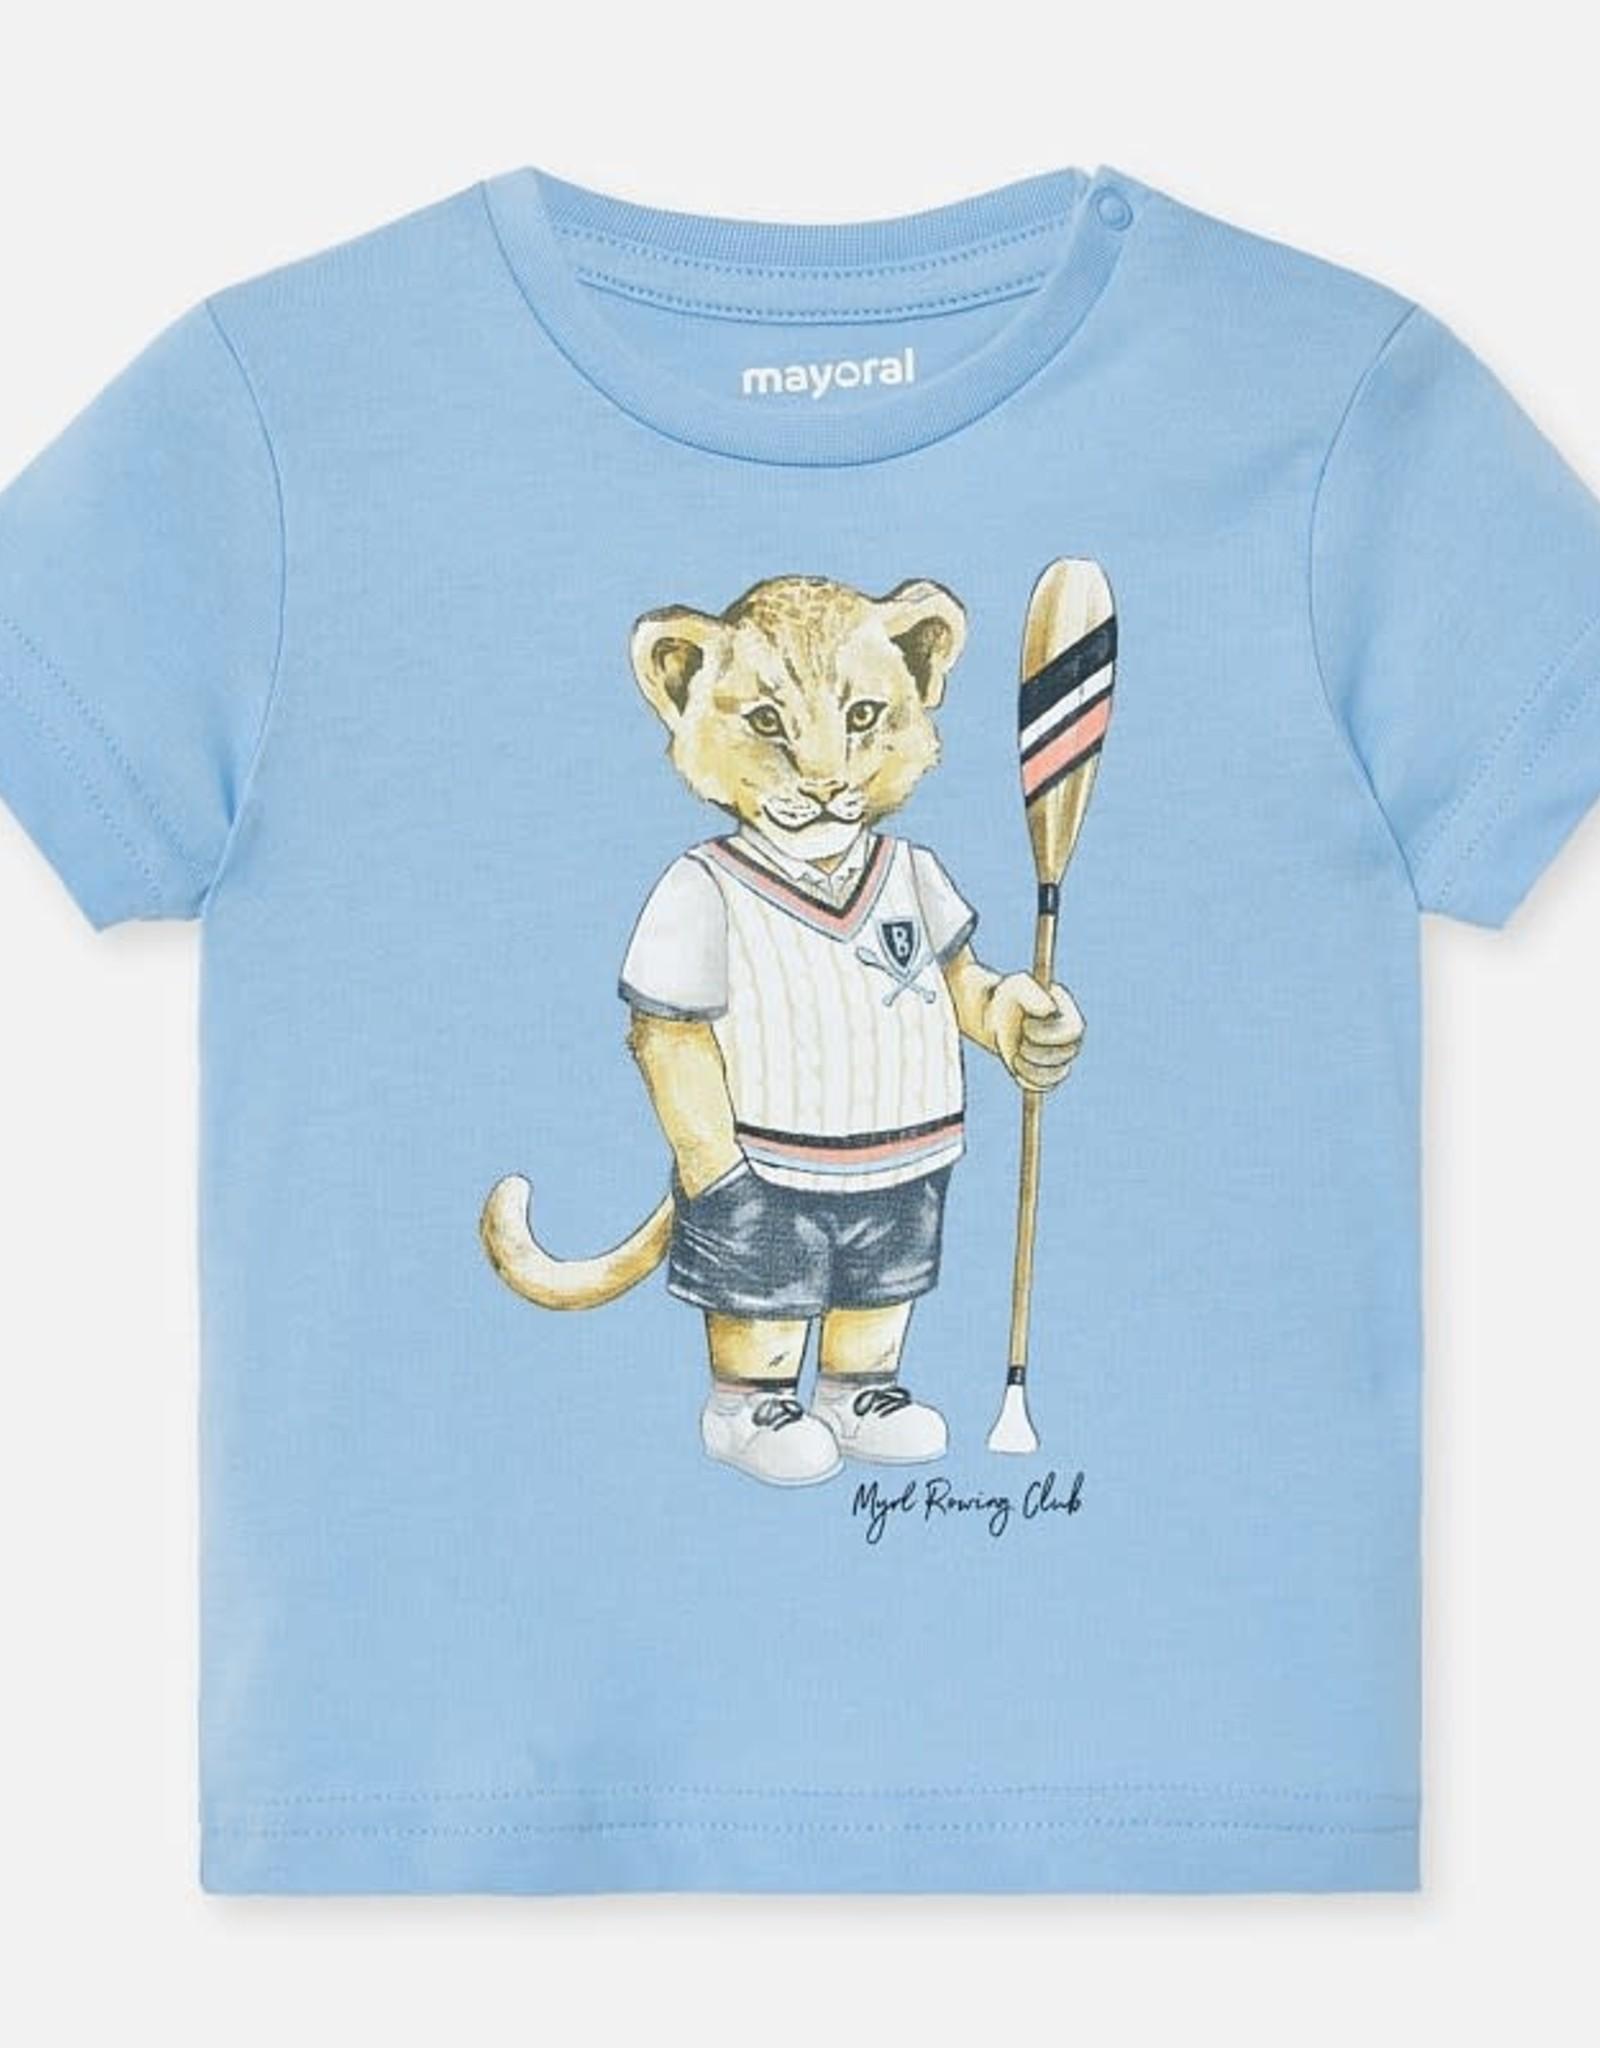 Mayoral Short Sleeve Sky Blue T-Shirt